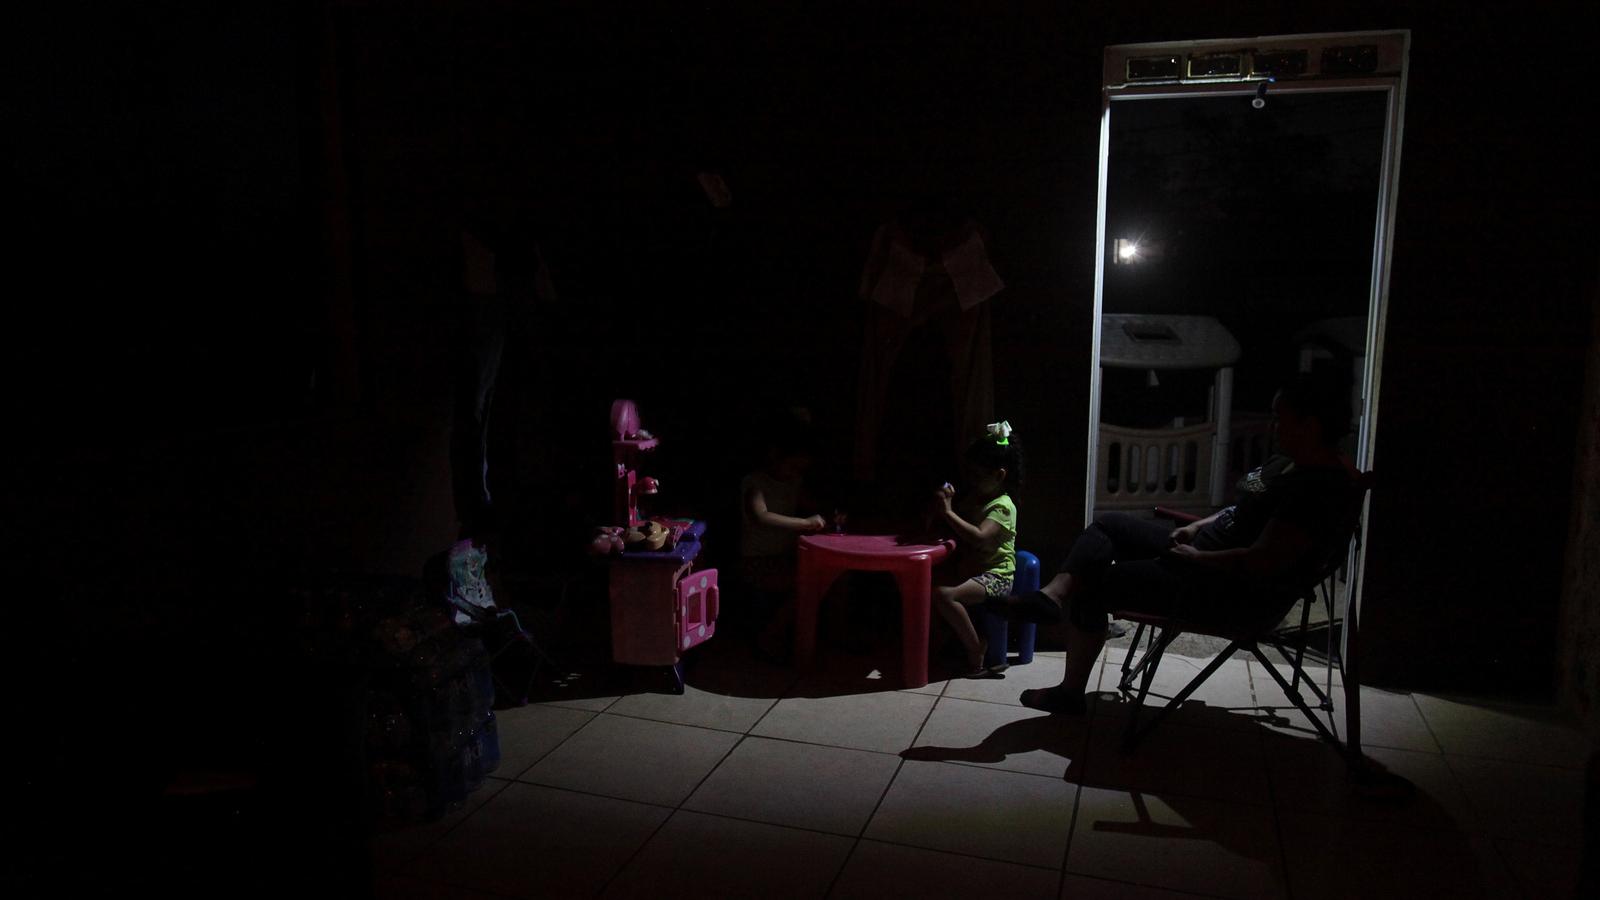 children play in the dark in puerto rico 8 months after hurricane maria